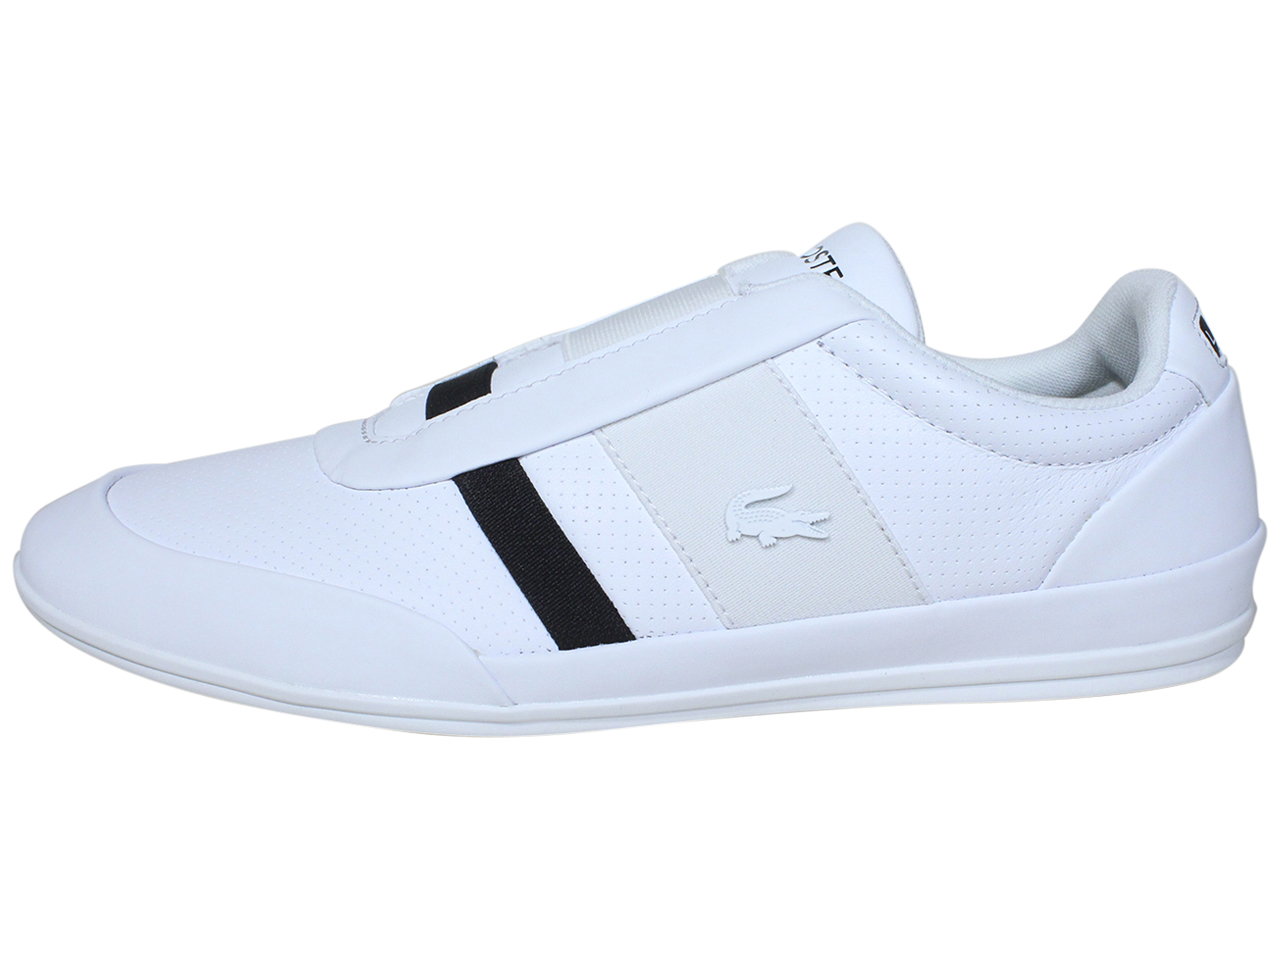 Lacoste-Misano-Elastic-318-Sneakers-Men-039-s-Low-Top-Shoes thumbnail 24